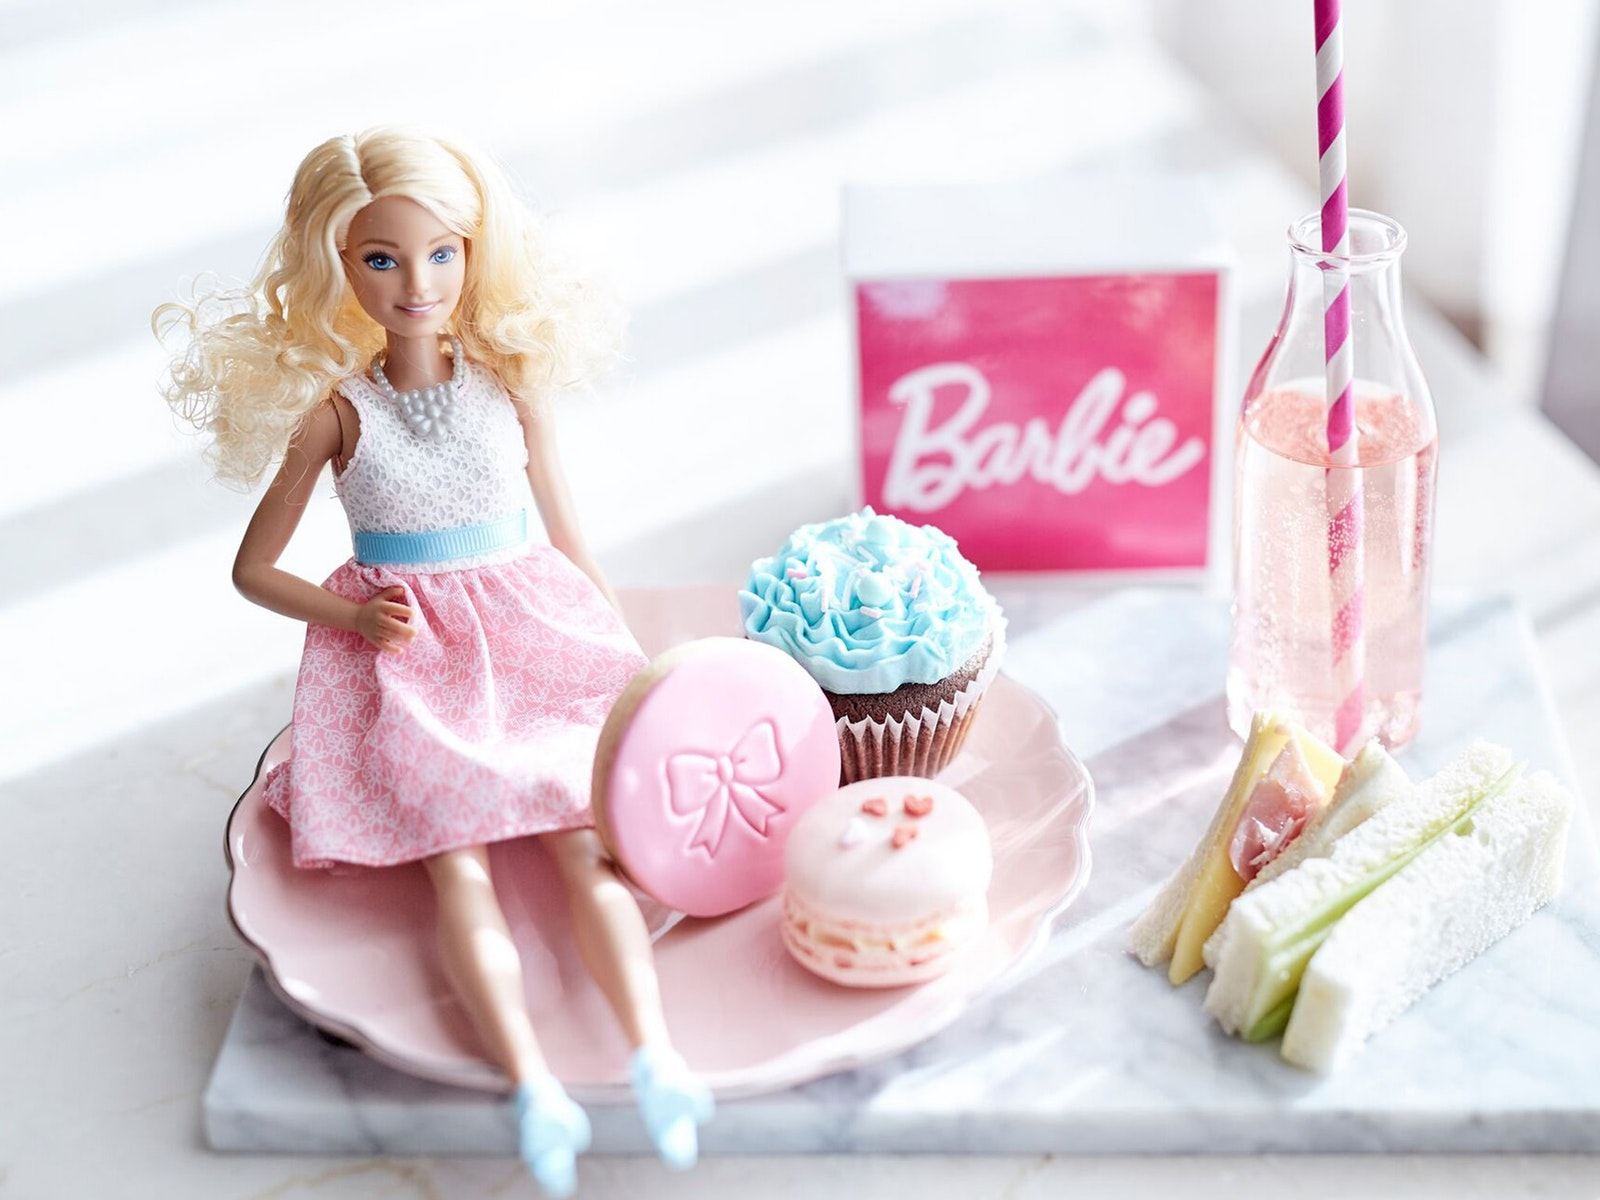 Barbie Fashionista High Tea